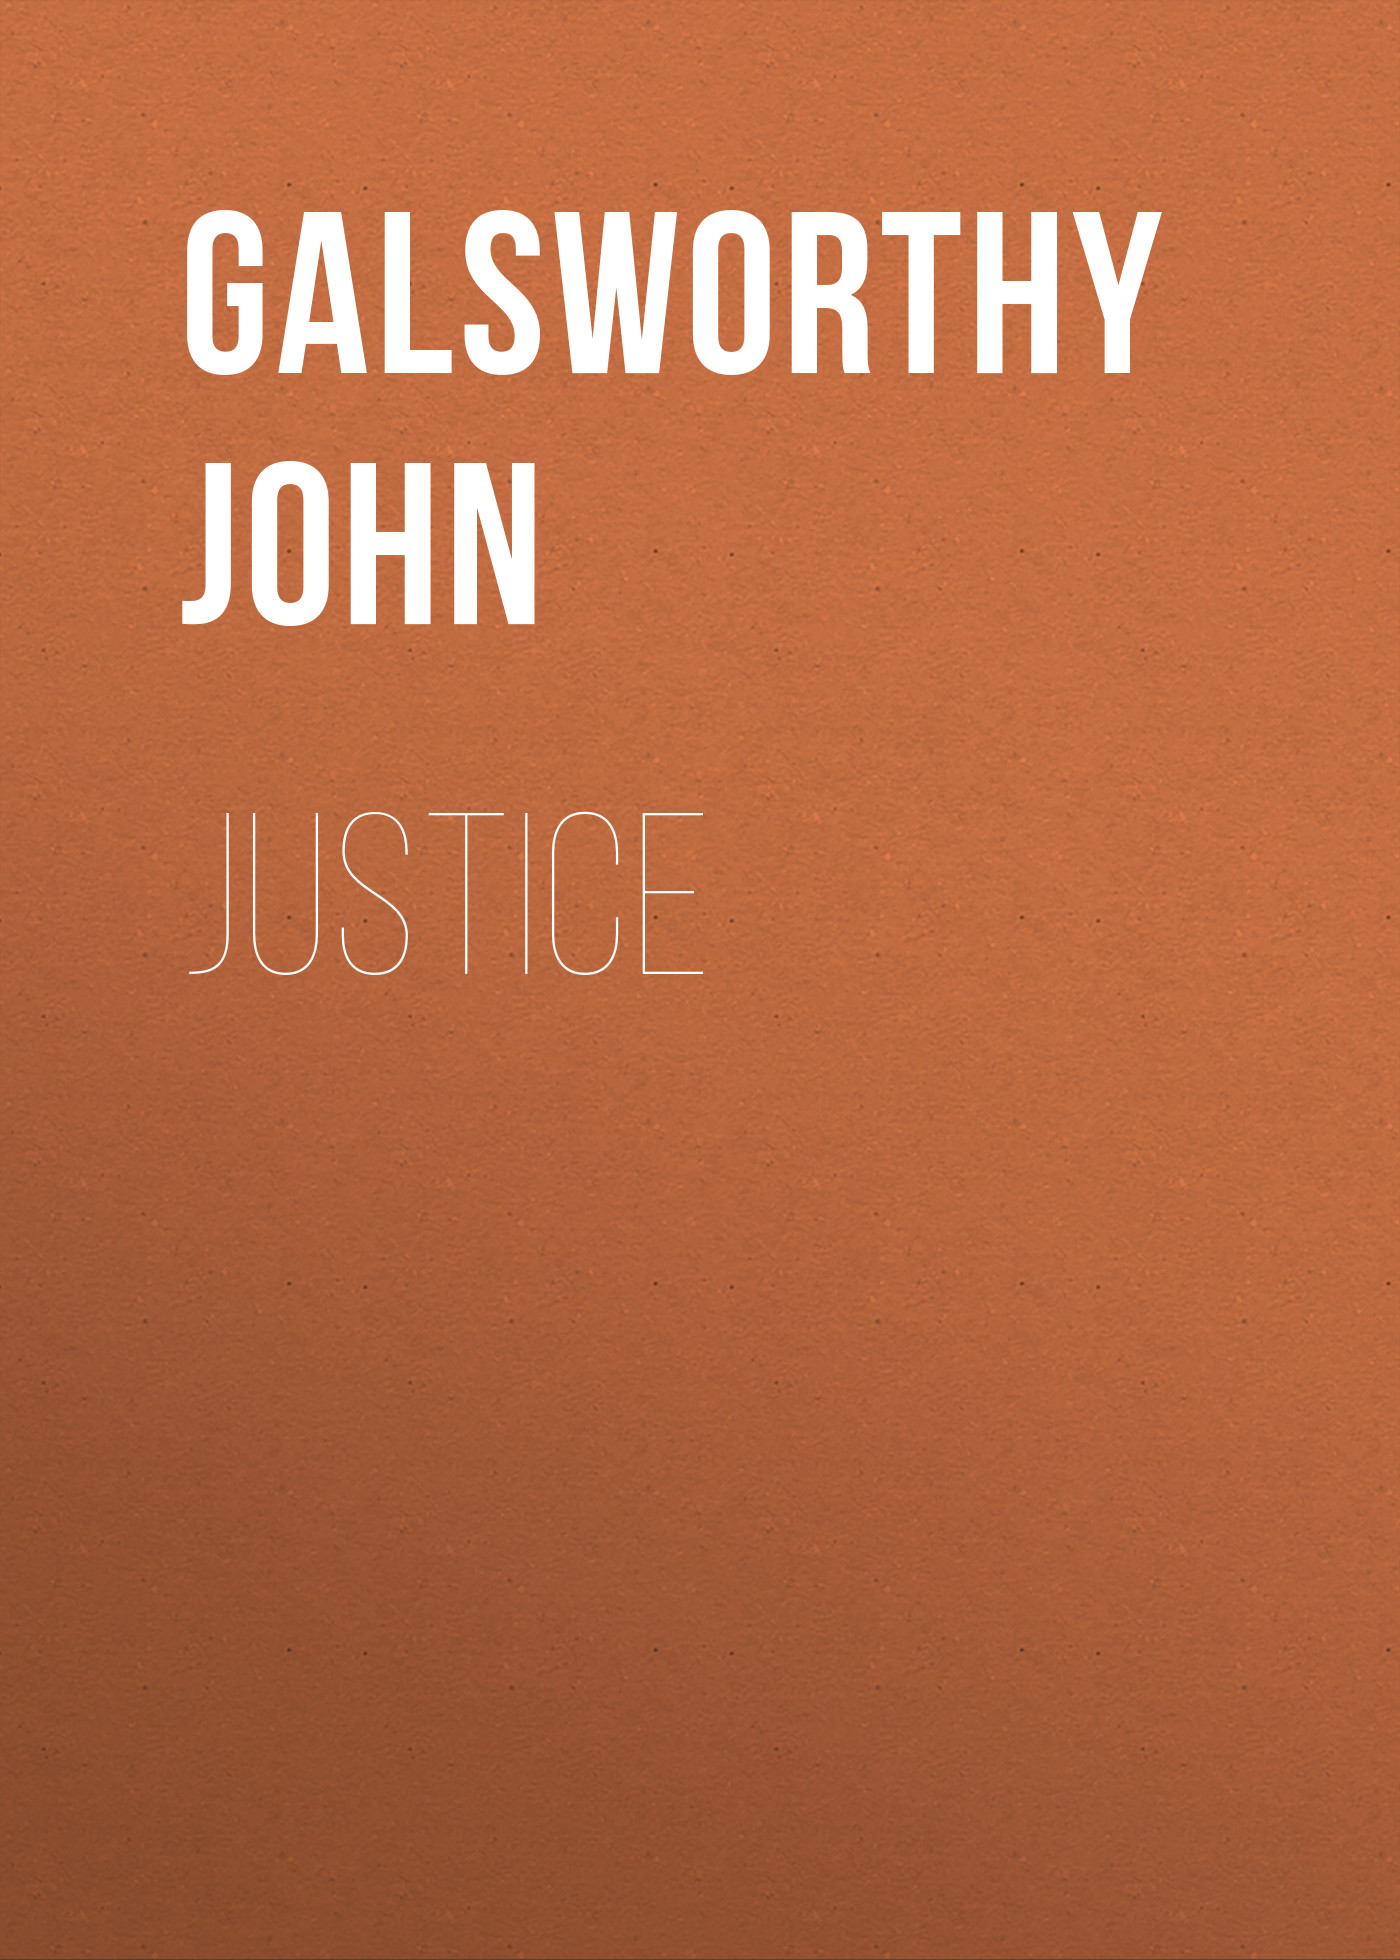 Galsworthy John Justice недорого